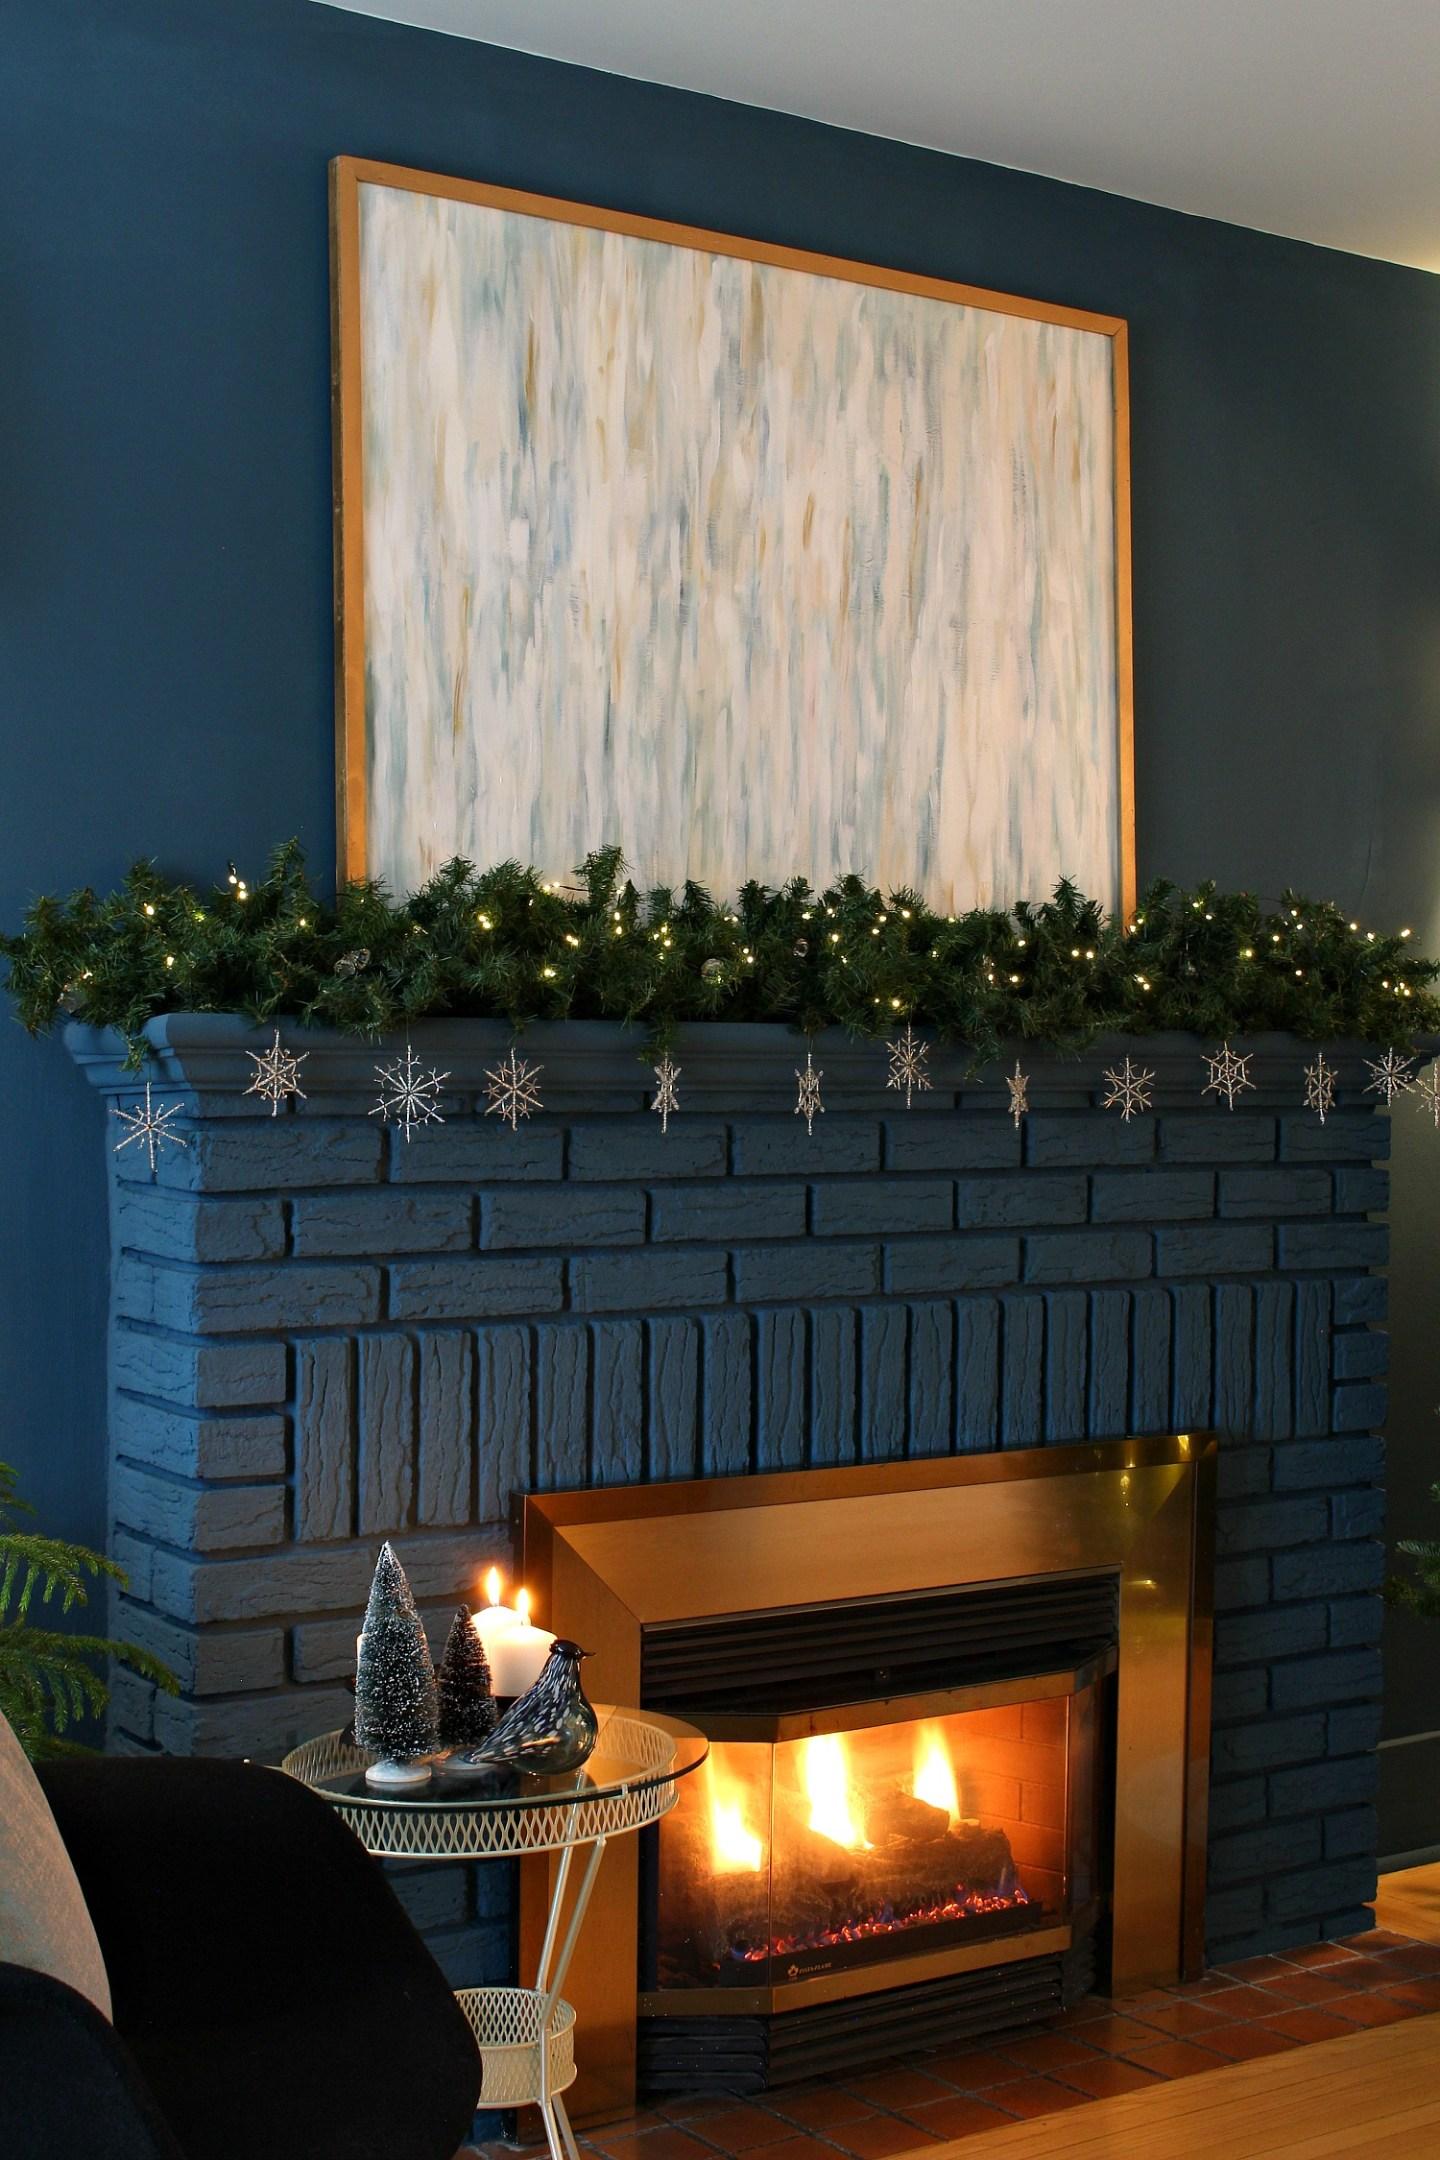 Wintry Mantel Decor That isn't Christmas Themed